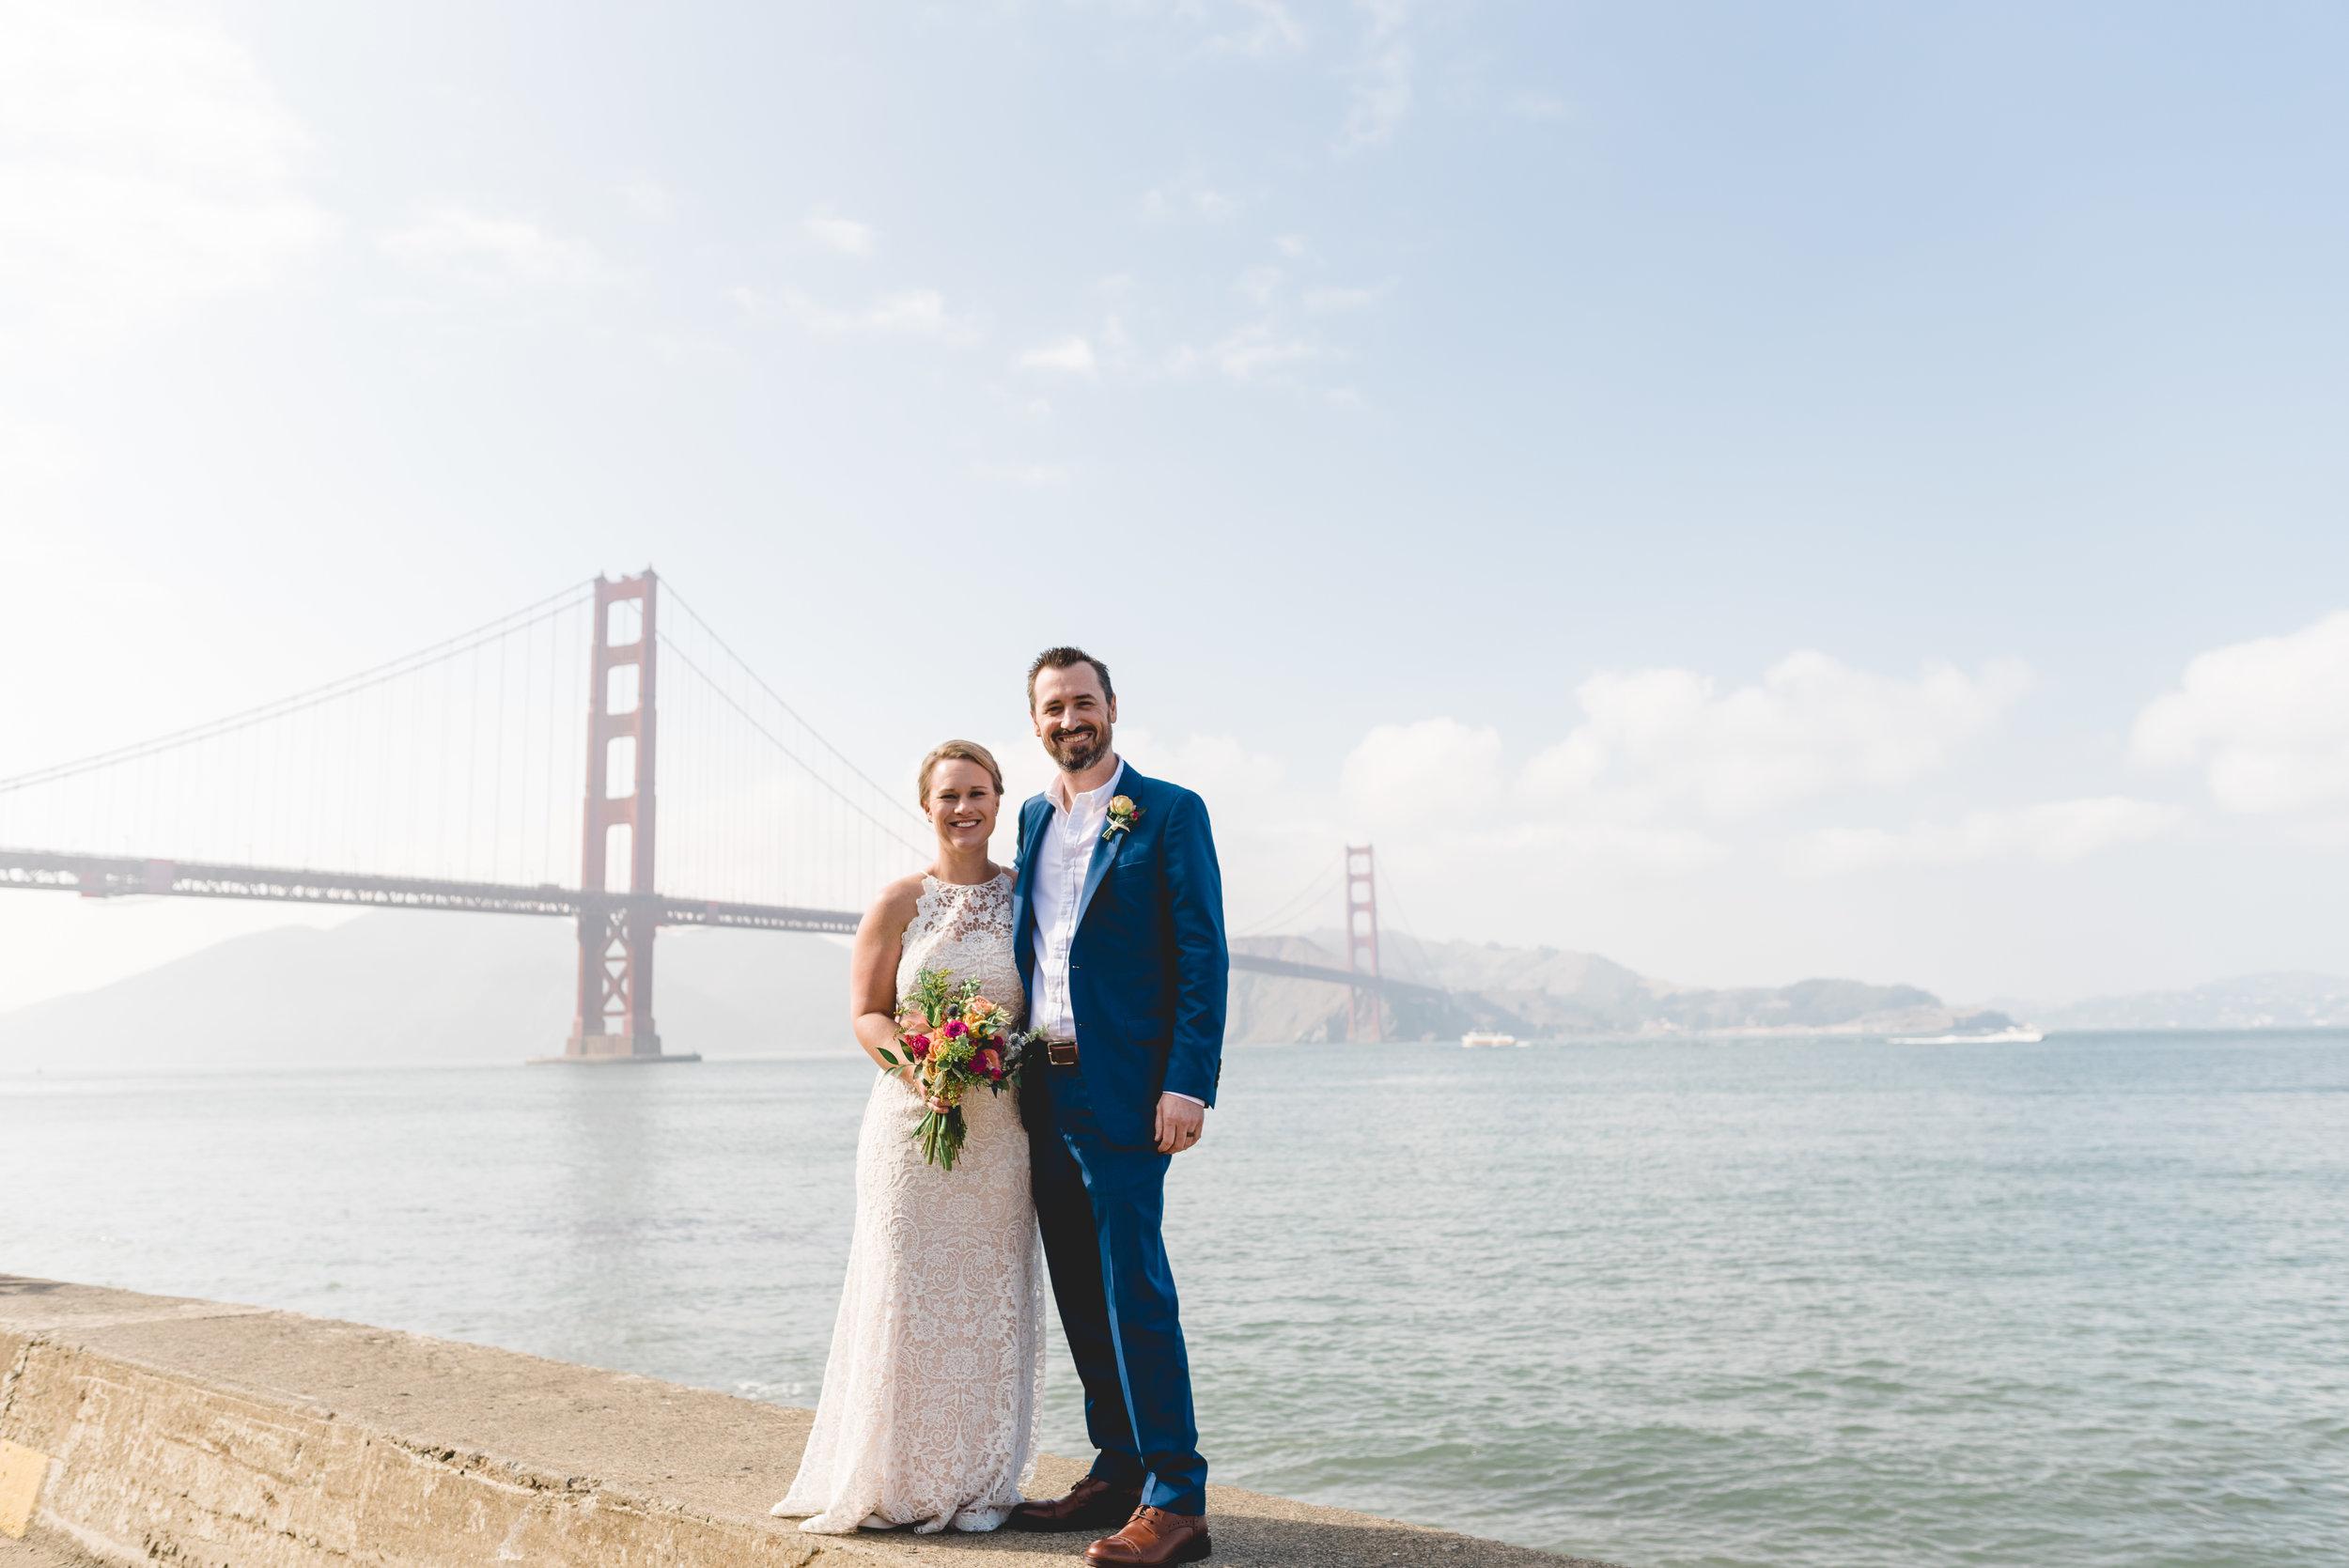 mcdaniels_conroy-wedding-couple-106.jpg